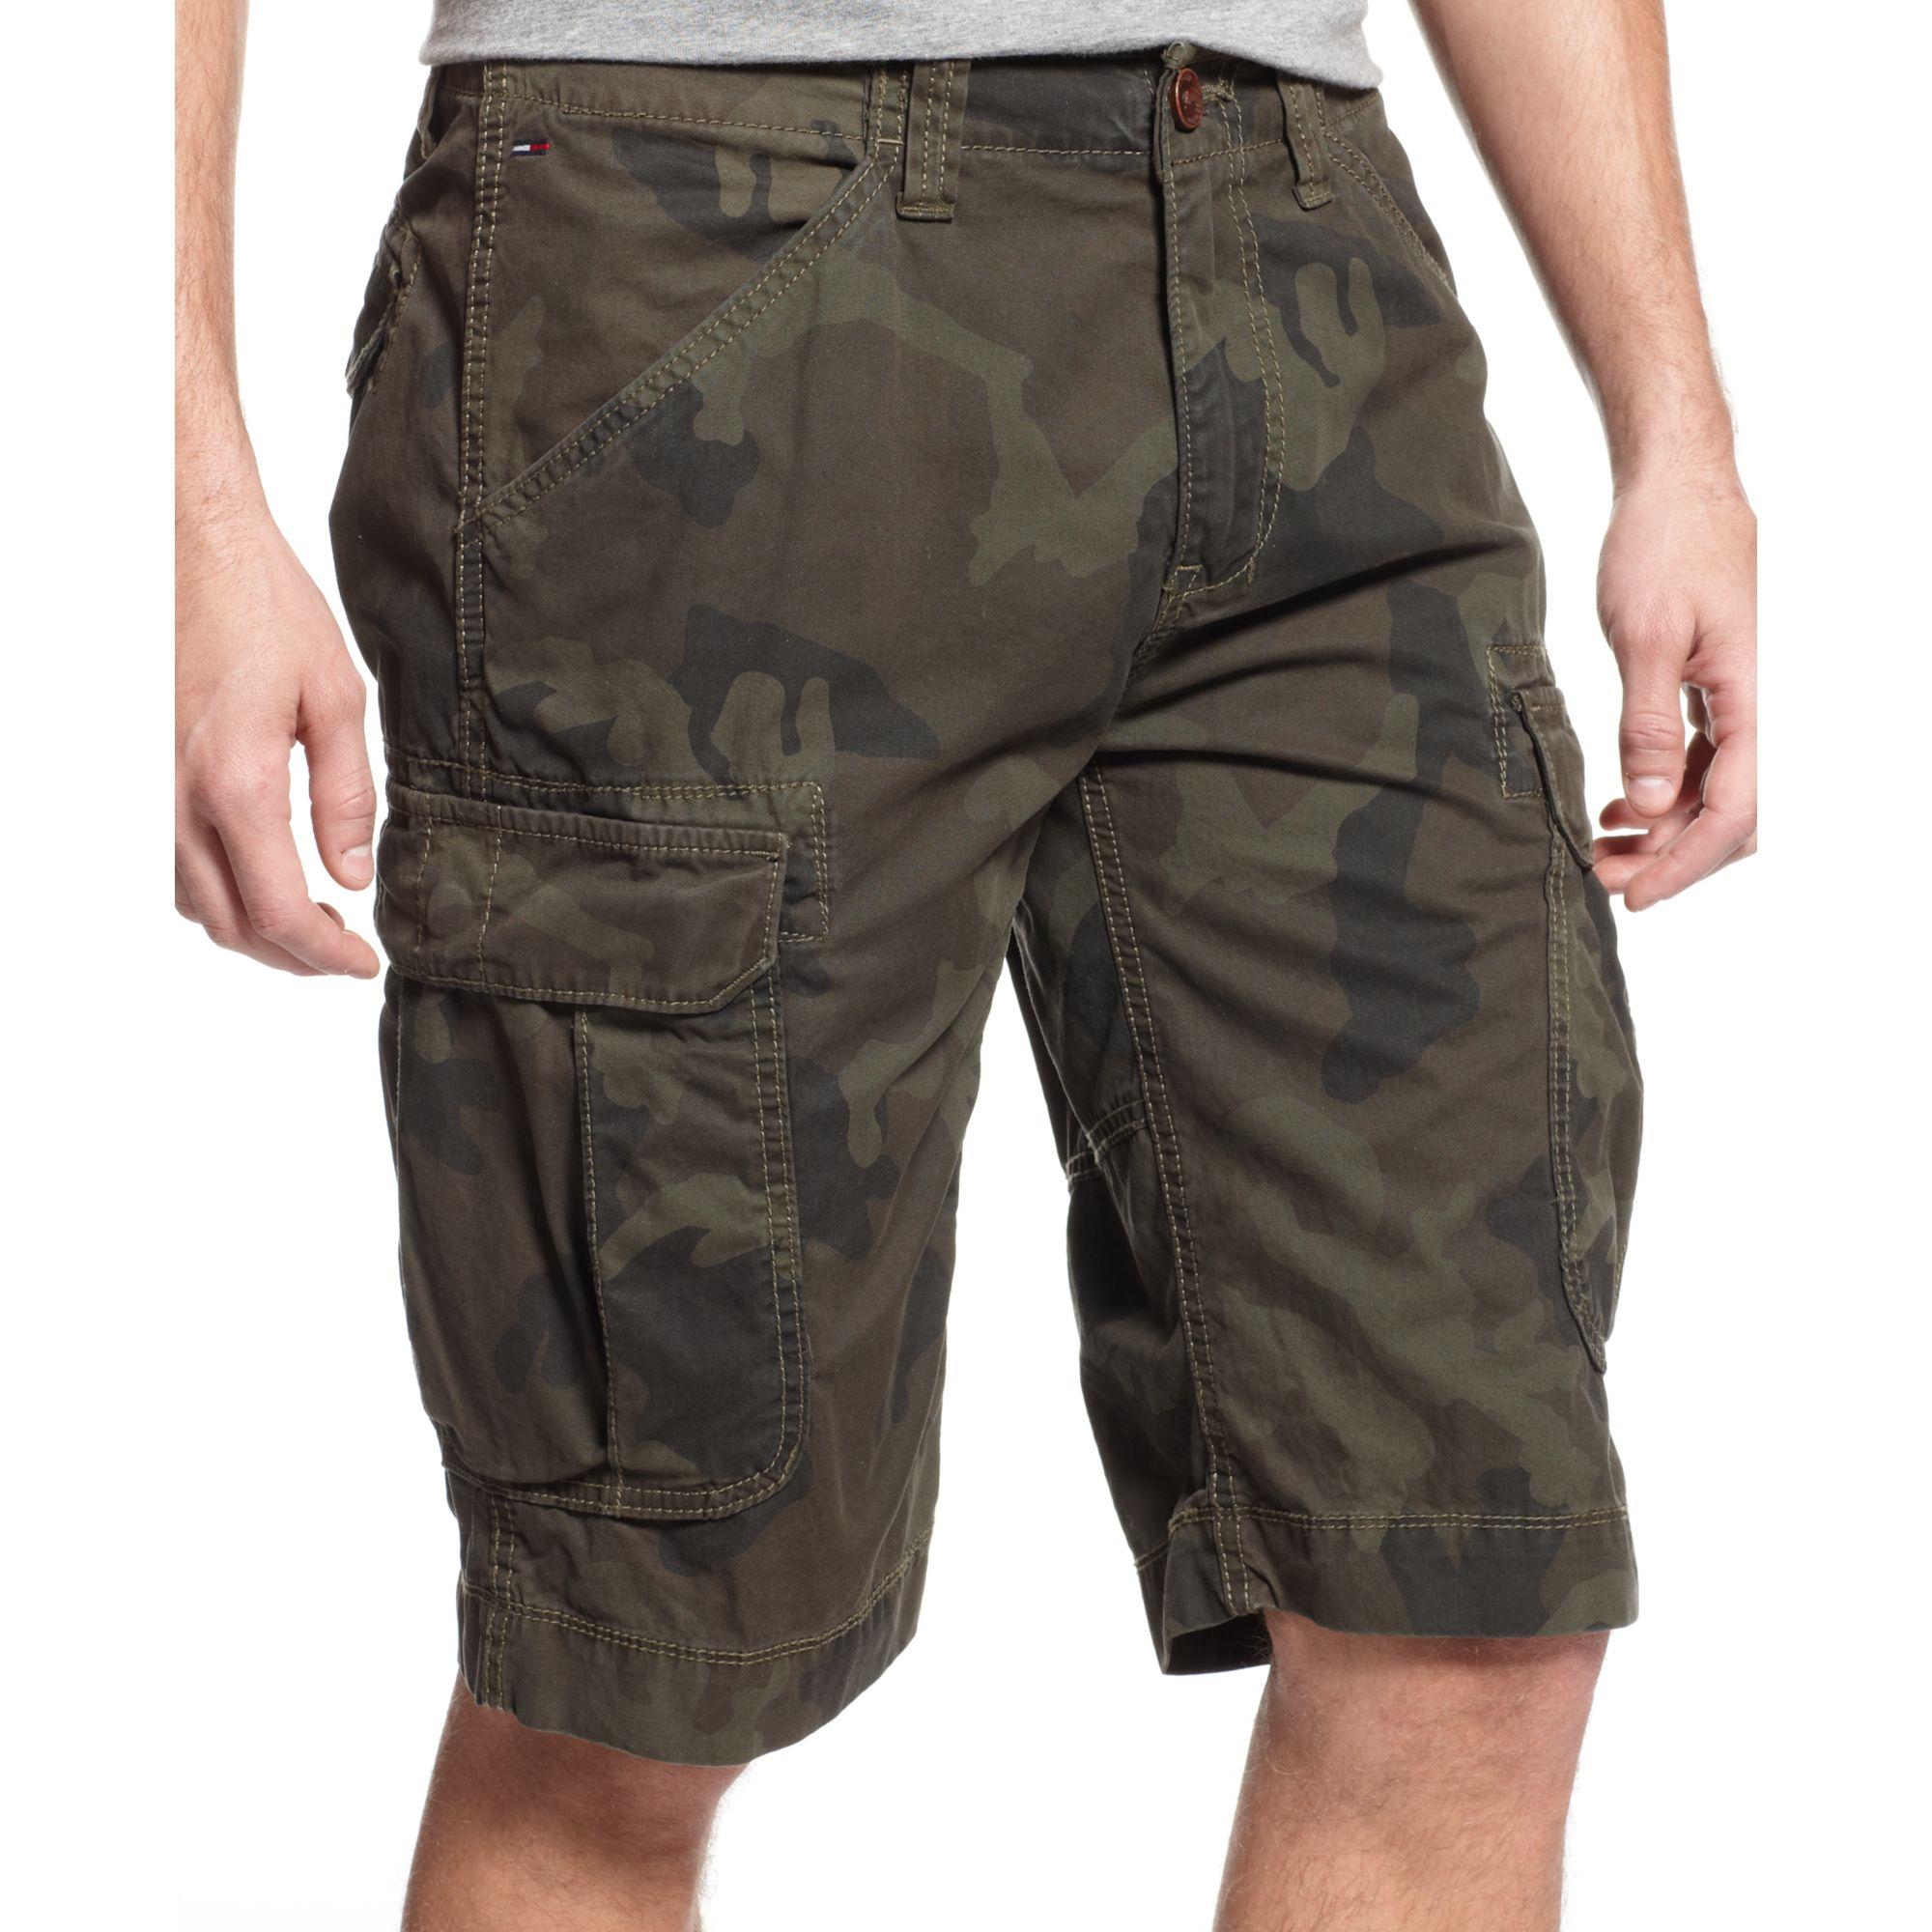 Tommy hilfiger Awol Camouflage Cargo Shorts Hilfiger Denim